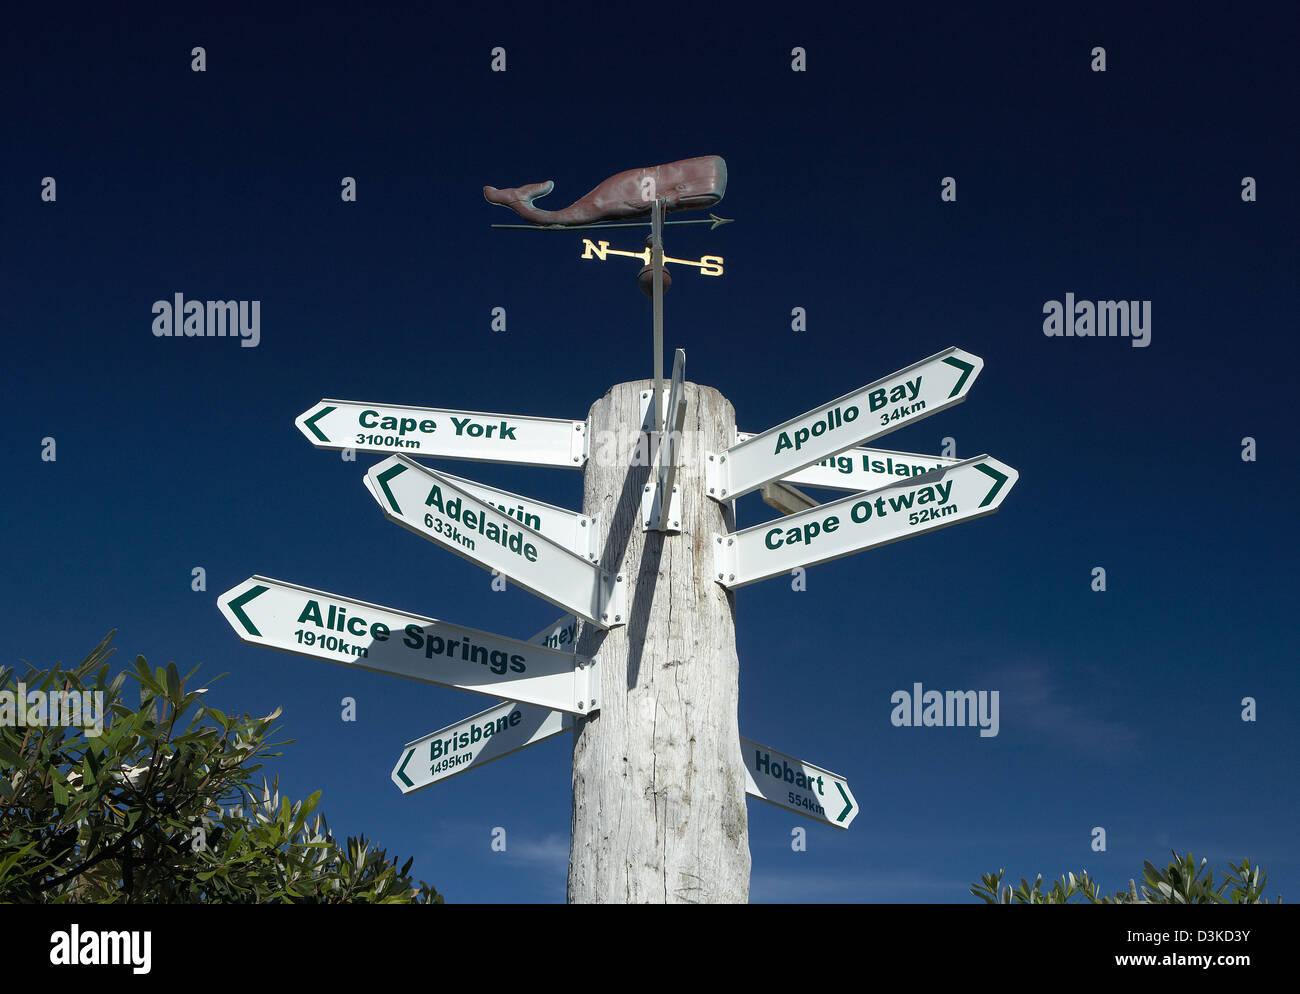 Lorne, Australia, signs indicate the distances of Australian cities - Stock Image